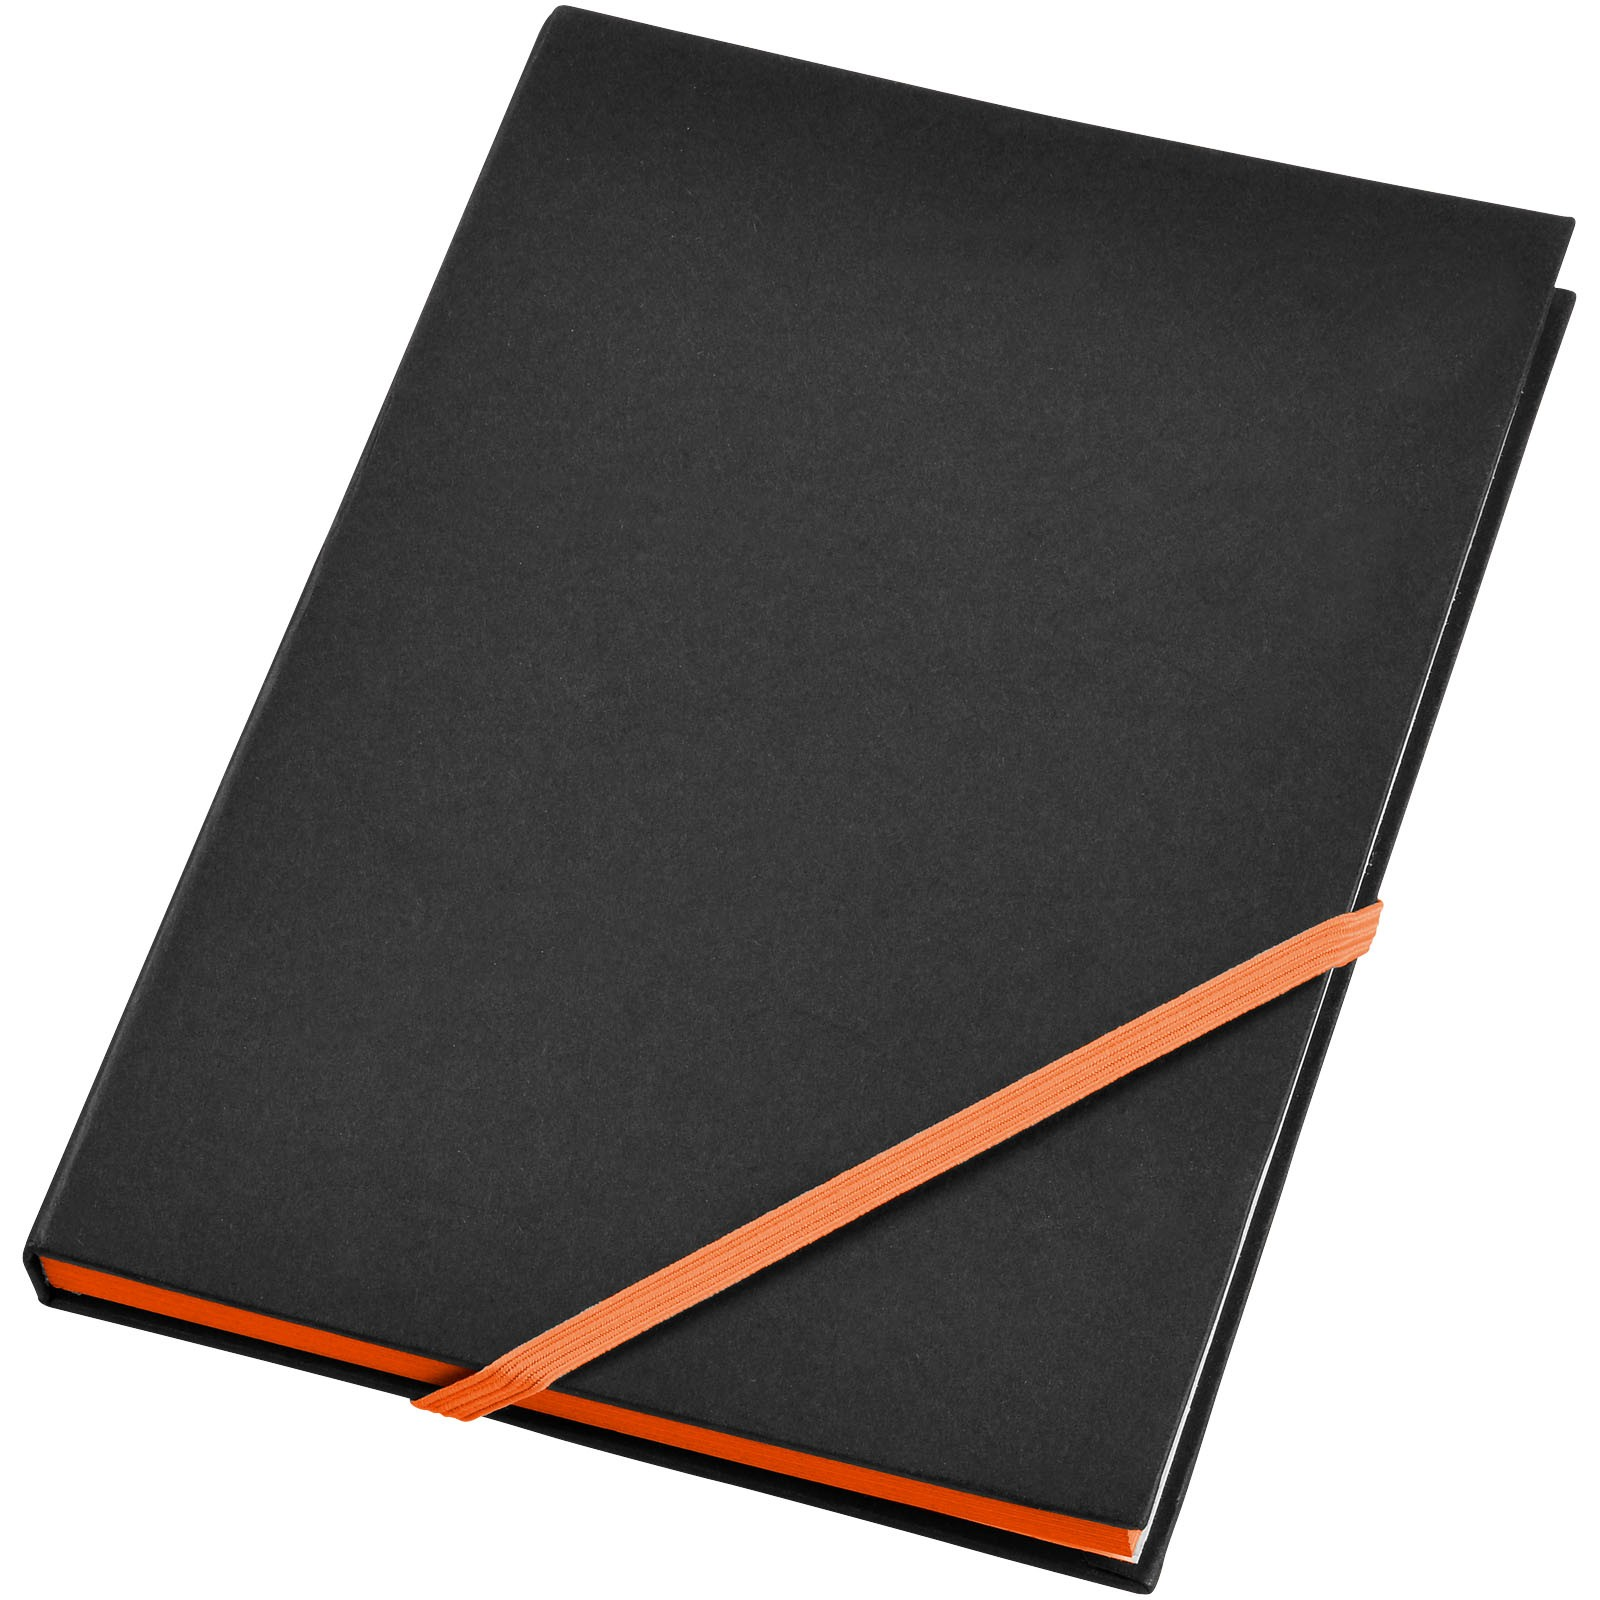 Travers hard cover notebook - Solid Black / Orange